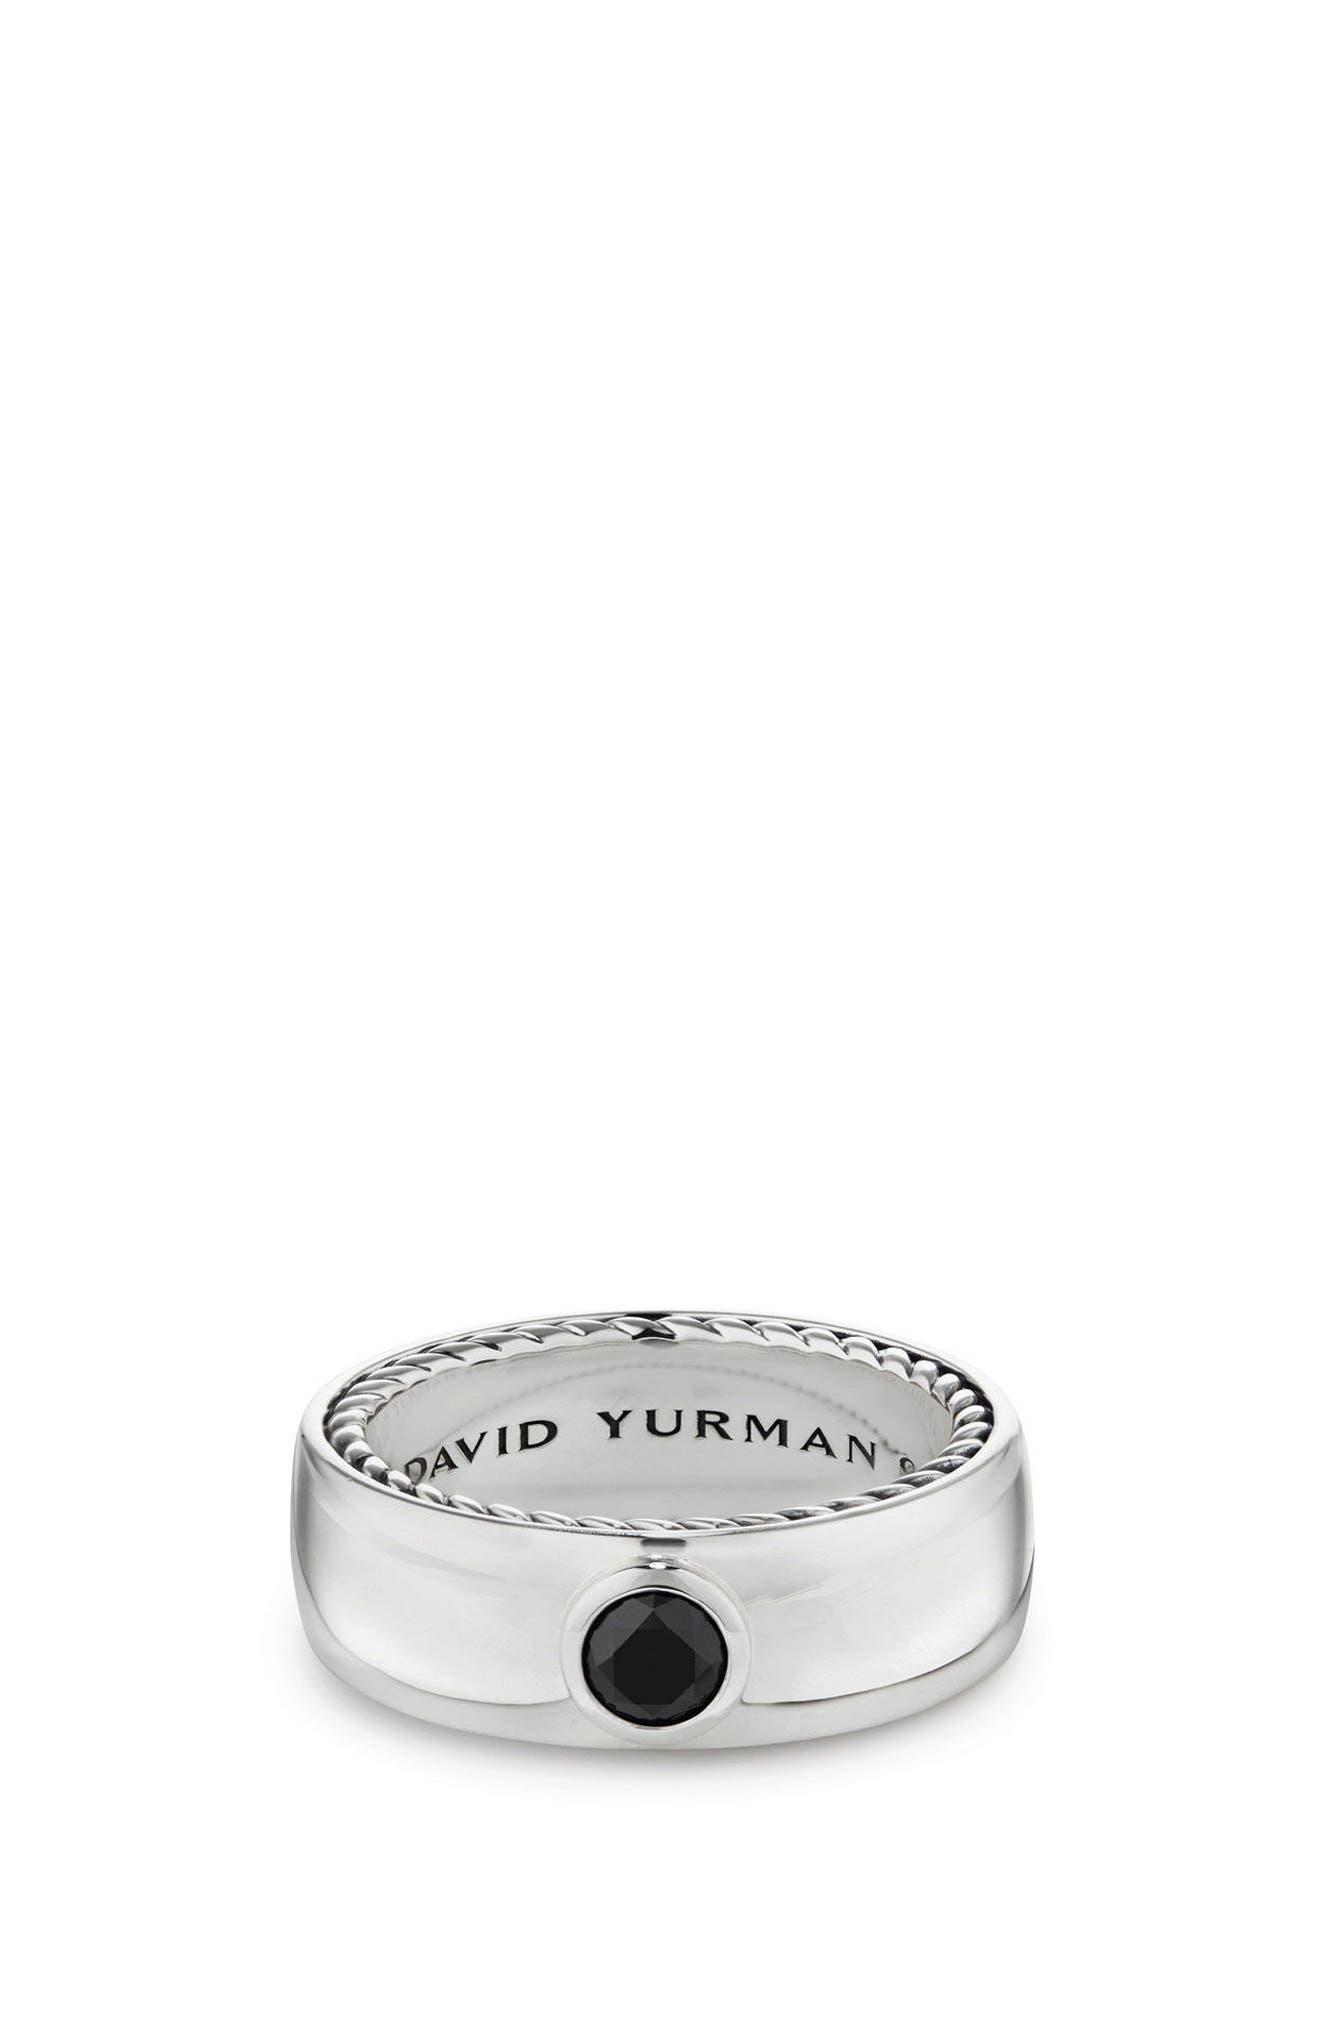 Main Image - David Yurman Streamline Band Ring with Black Diamond, 6mm